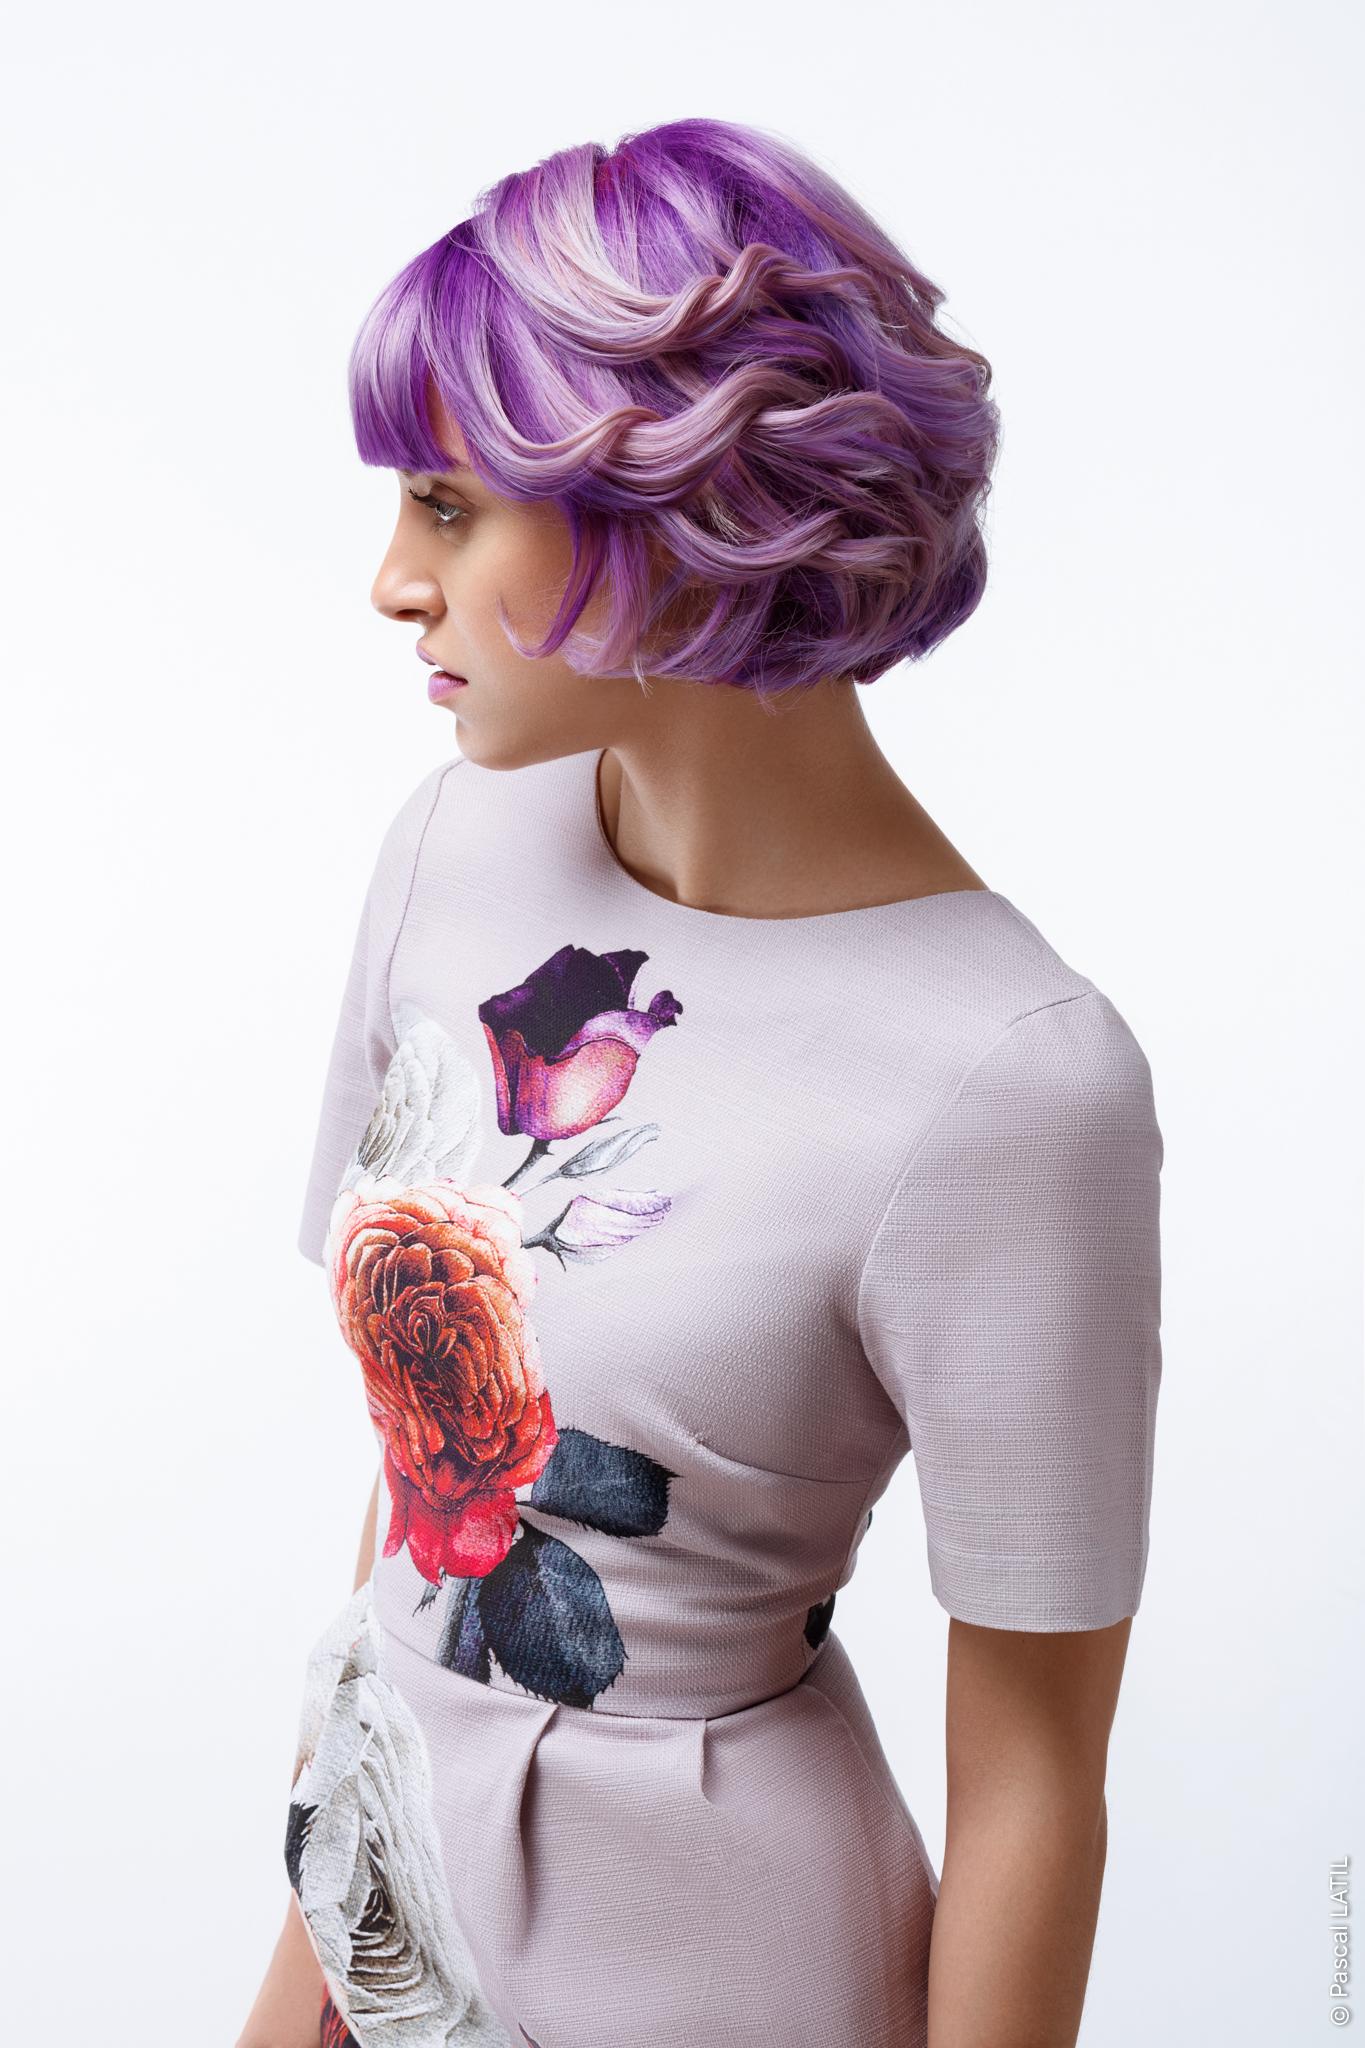 Photo©Pascal_LATIL_-Hair©Laurie_Cesari_-_Web_-_7